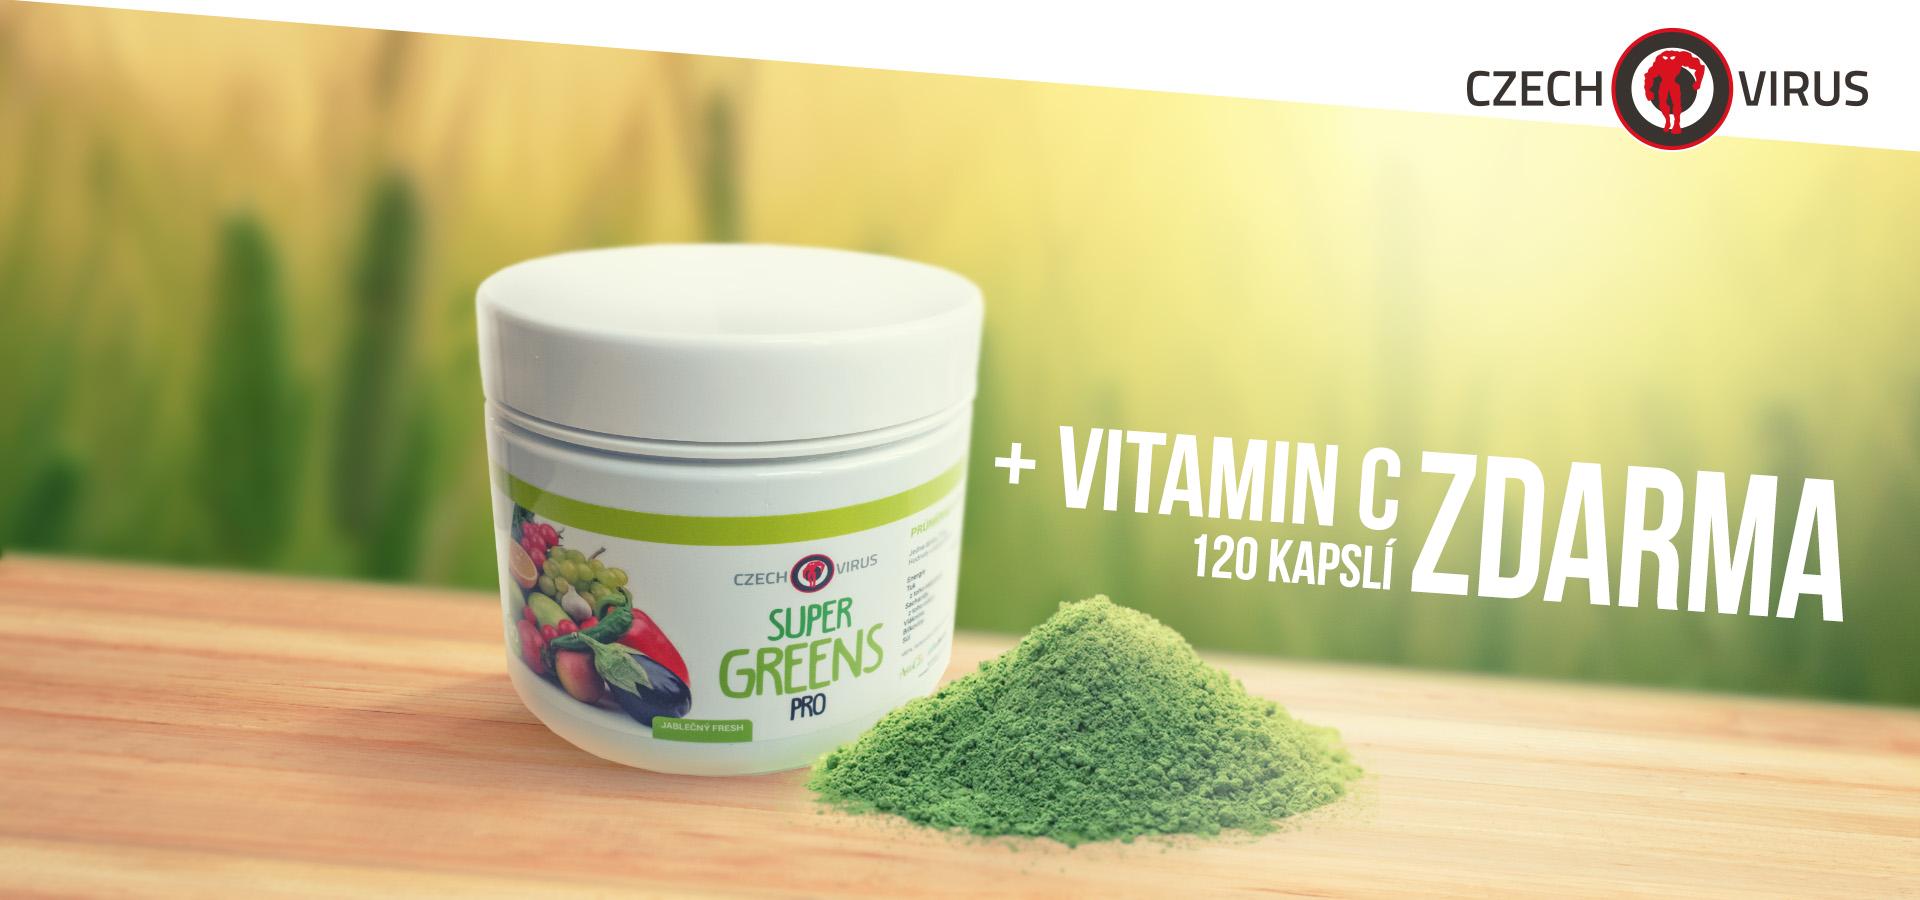 Super Greens akce s vitamínem C